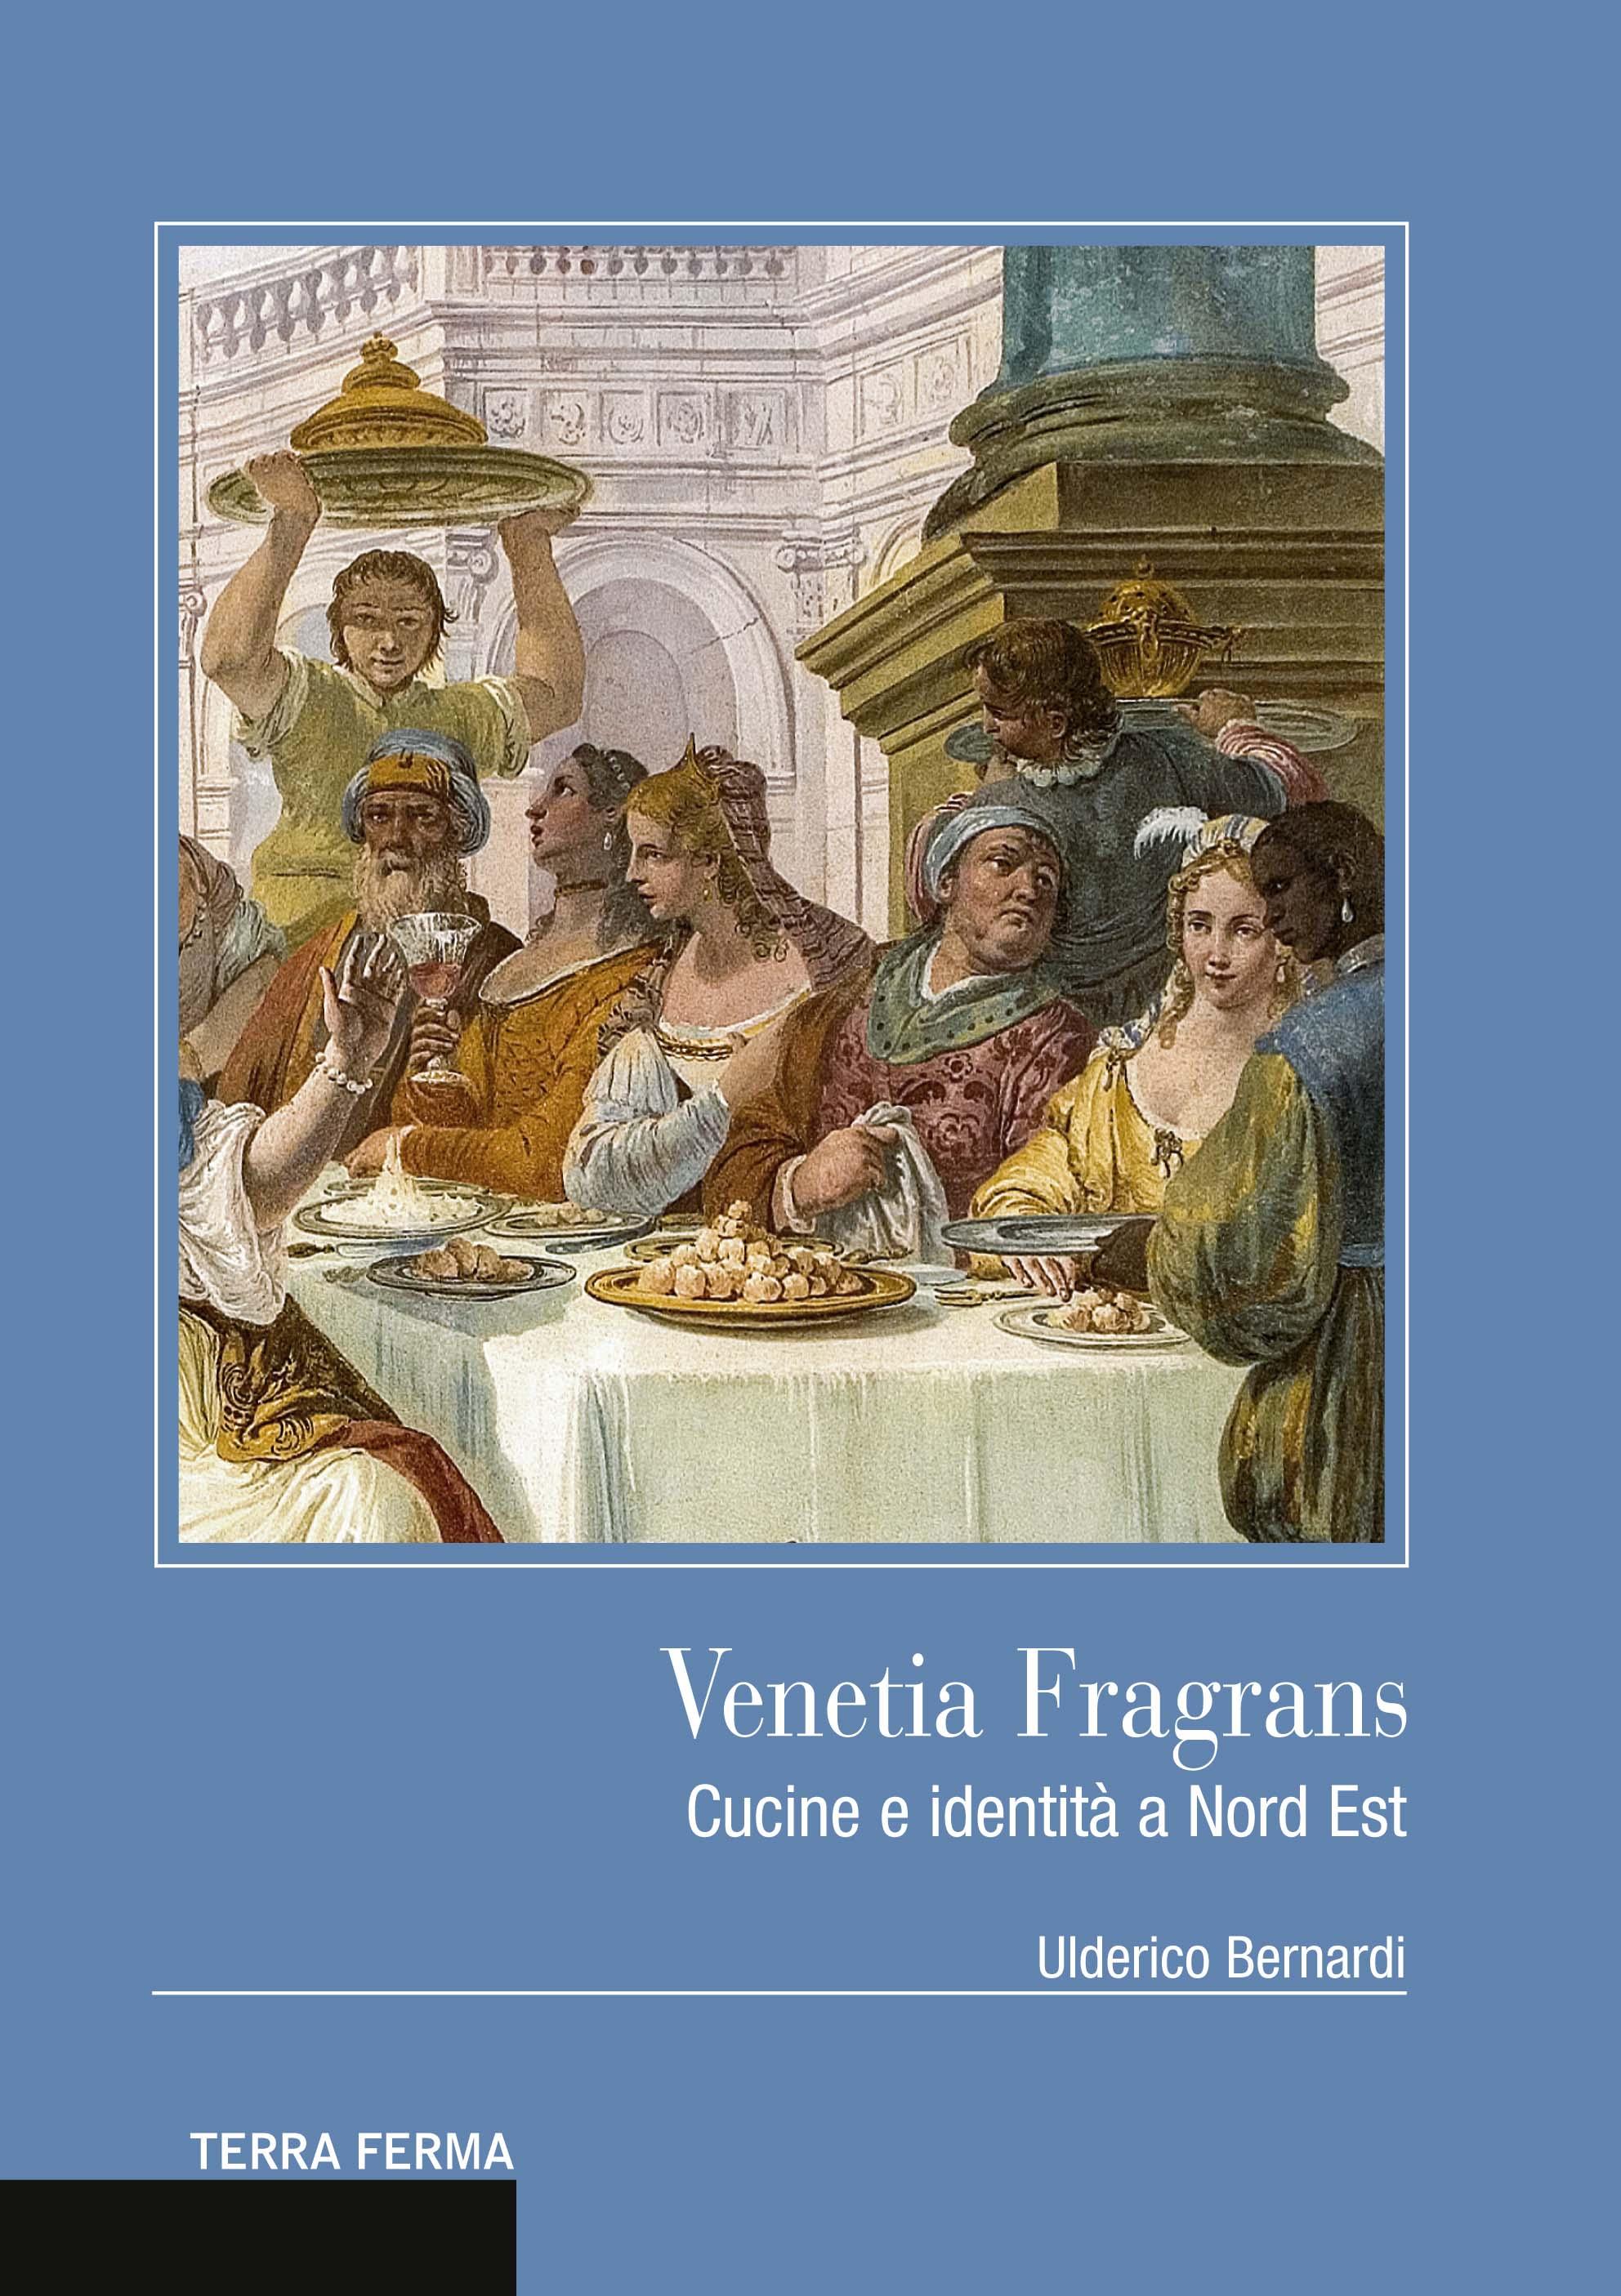 166671_Copertina_Venetia.indd